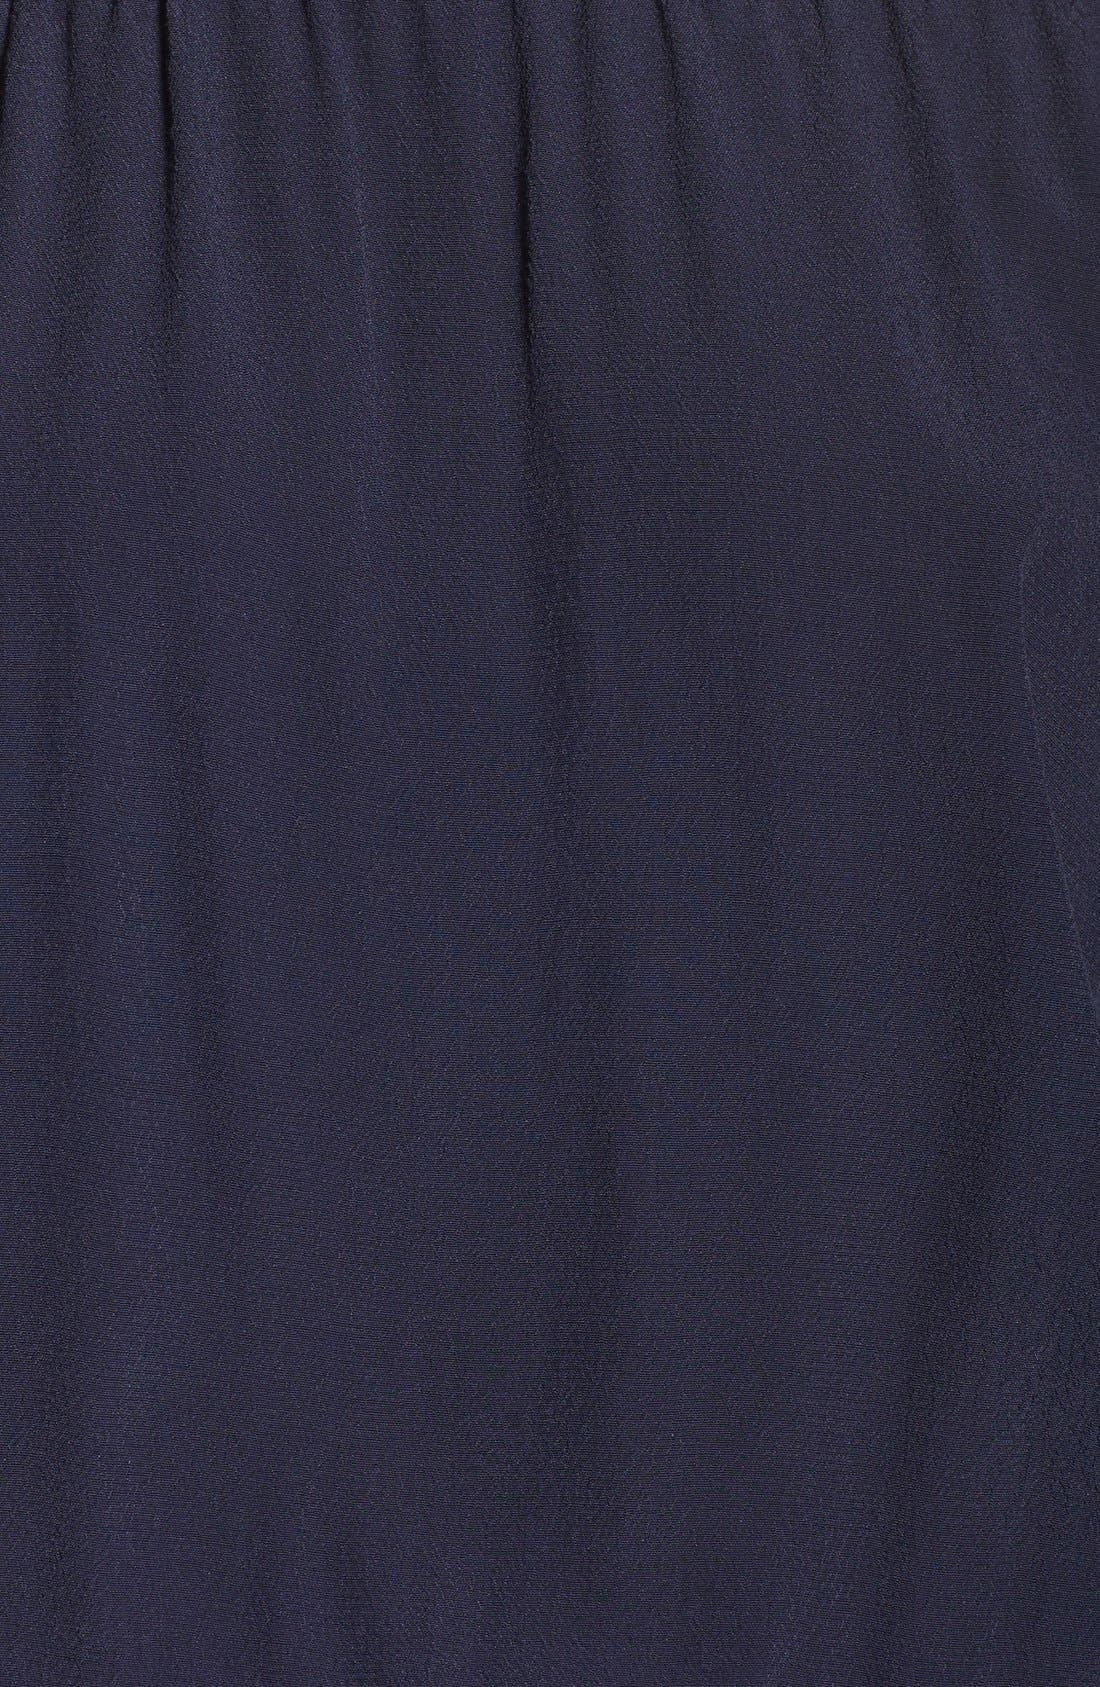 Off the Shoulder Jumpsuit,                             Alternate thumbnail 5, color,                             Navy